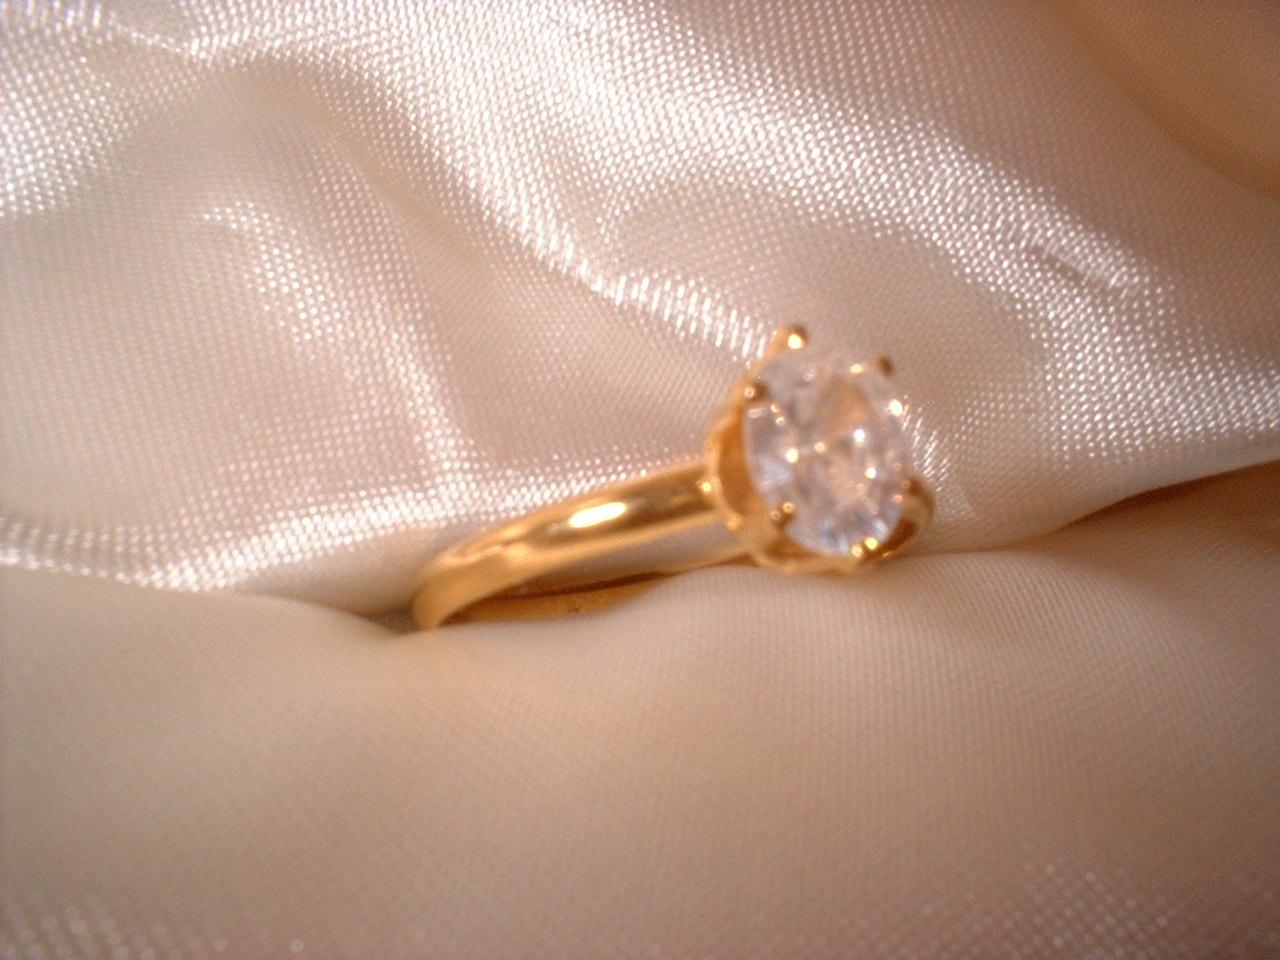 Oval Crystal  Ring Size 8 Bargain Bin Under $10.00